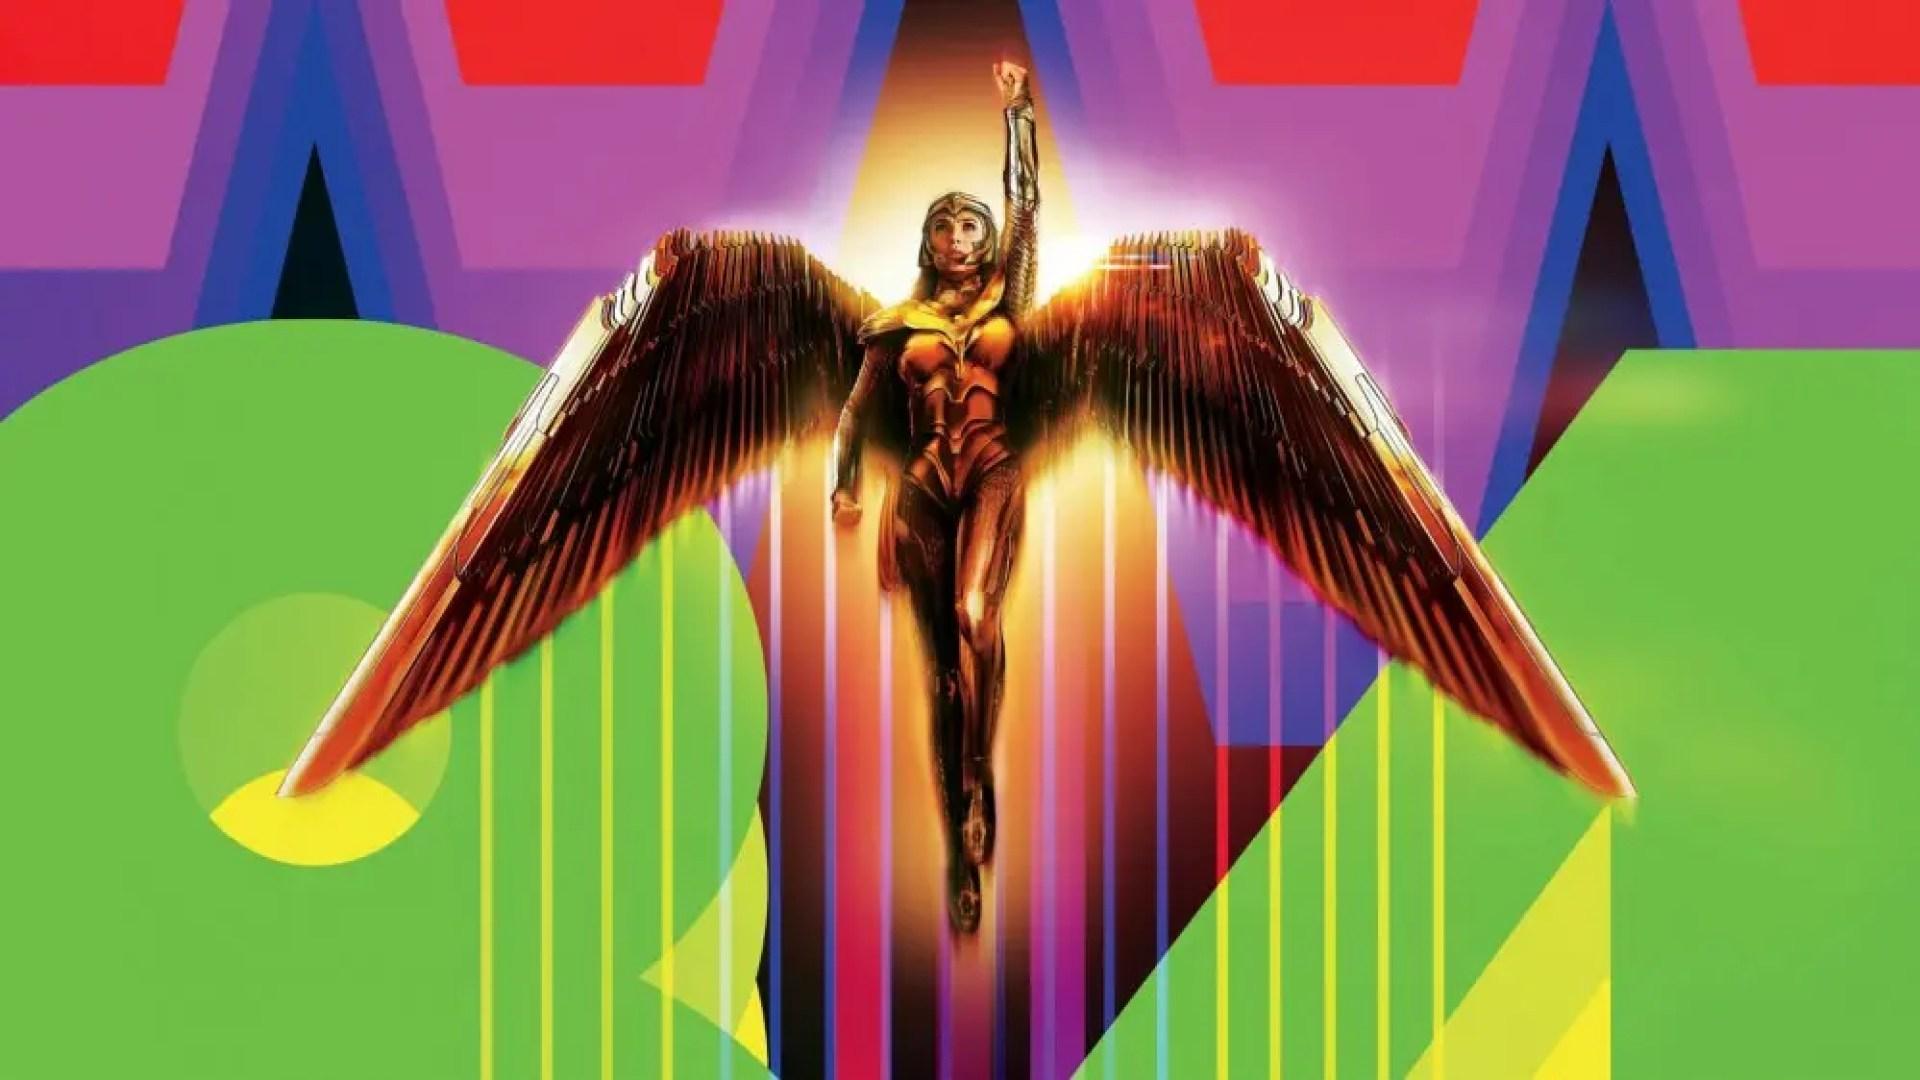 Wonder Woman 1984 promotional image